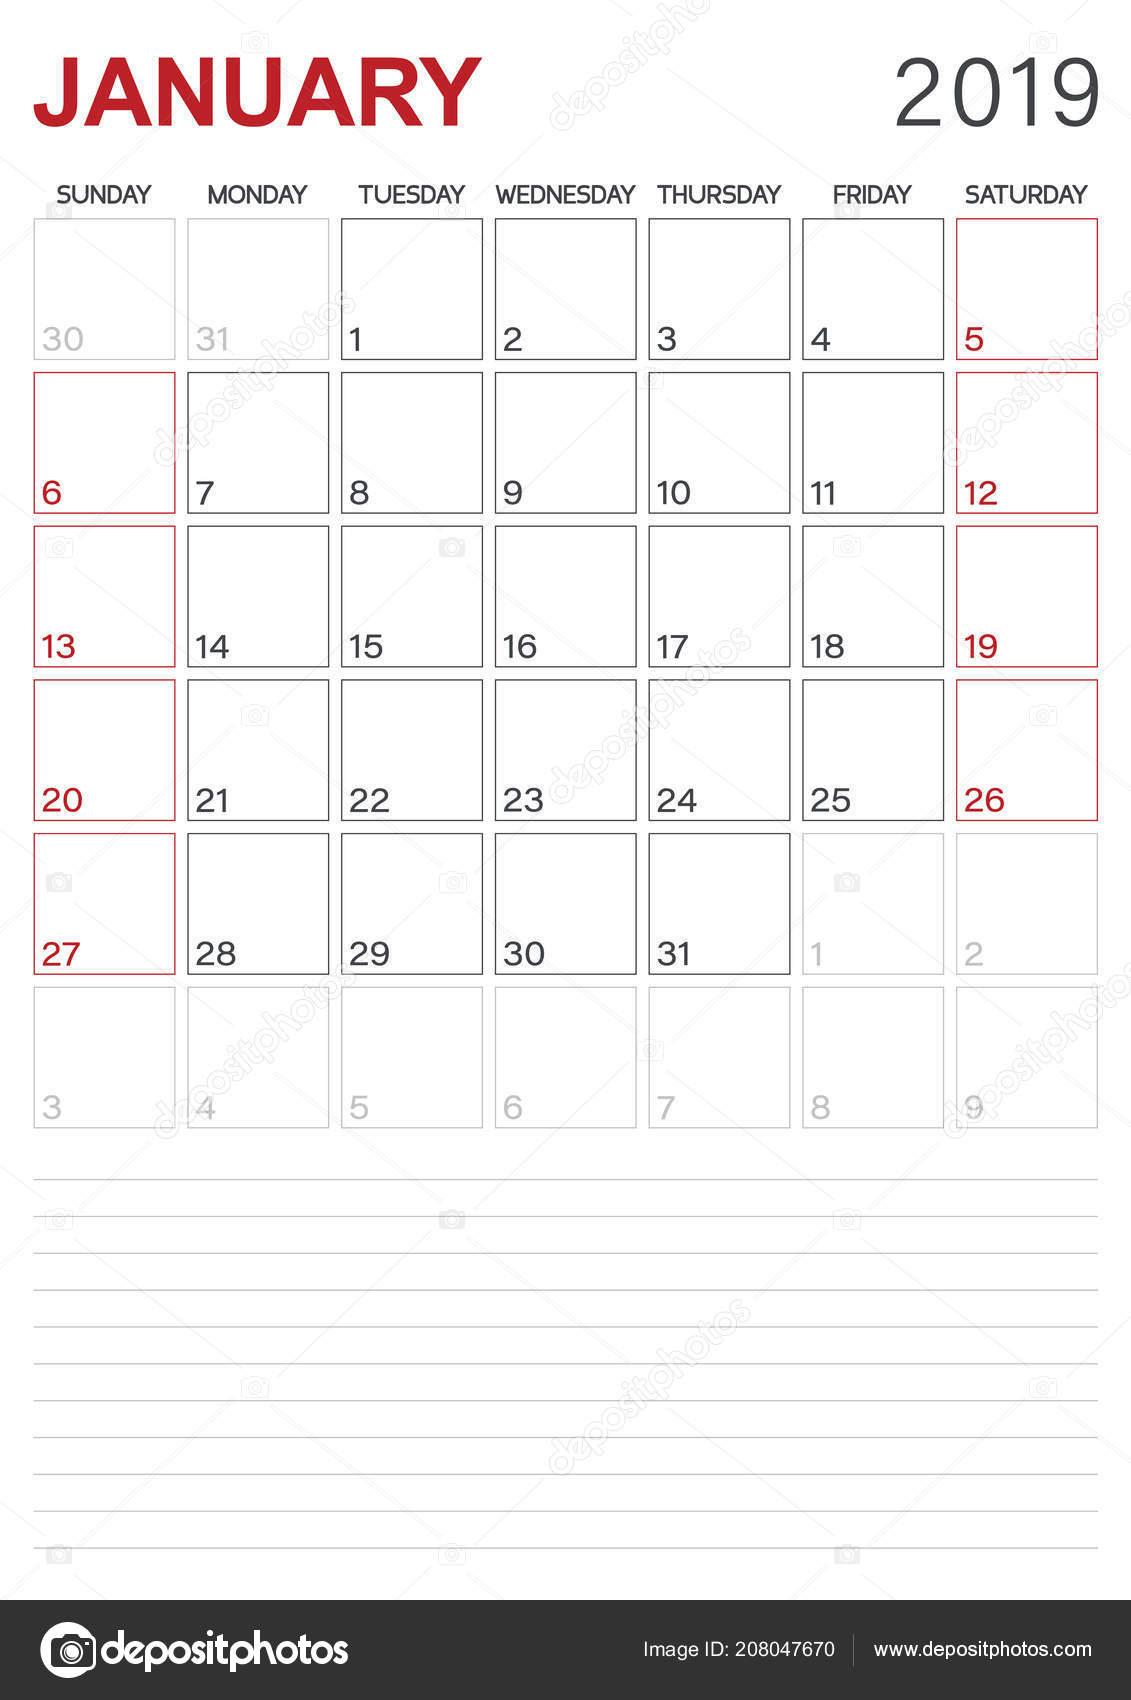 English Calendar 2019 Monthly Planner Calendar January 2019